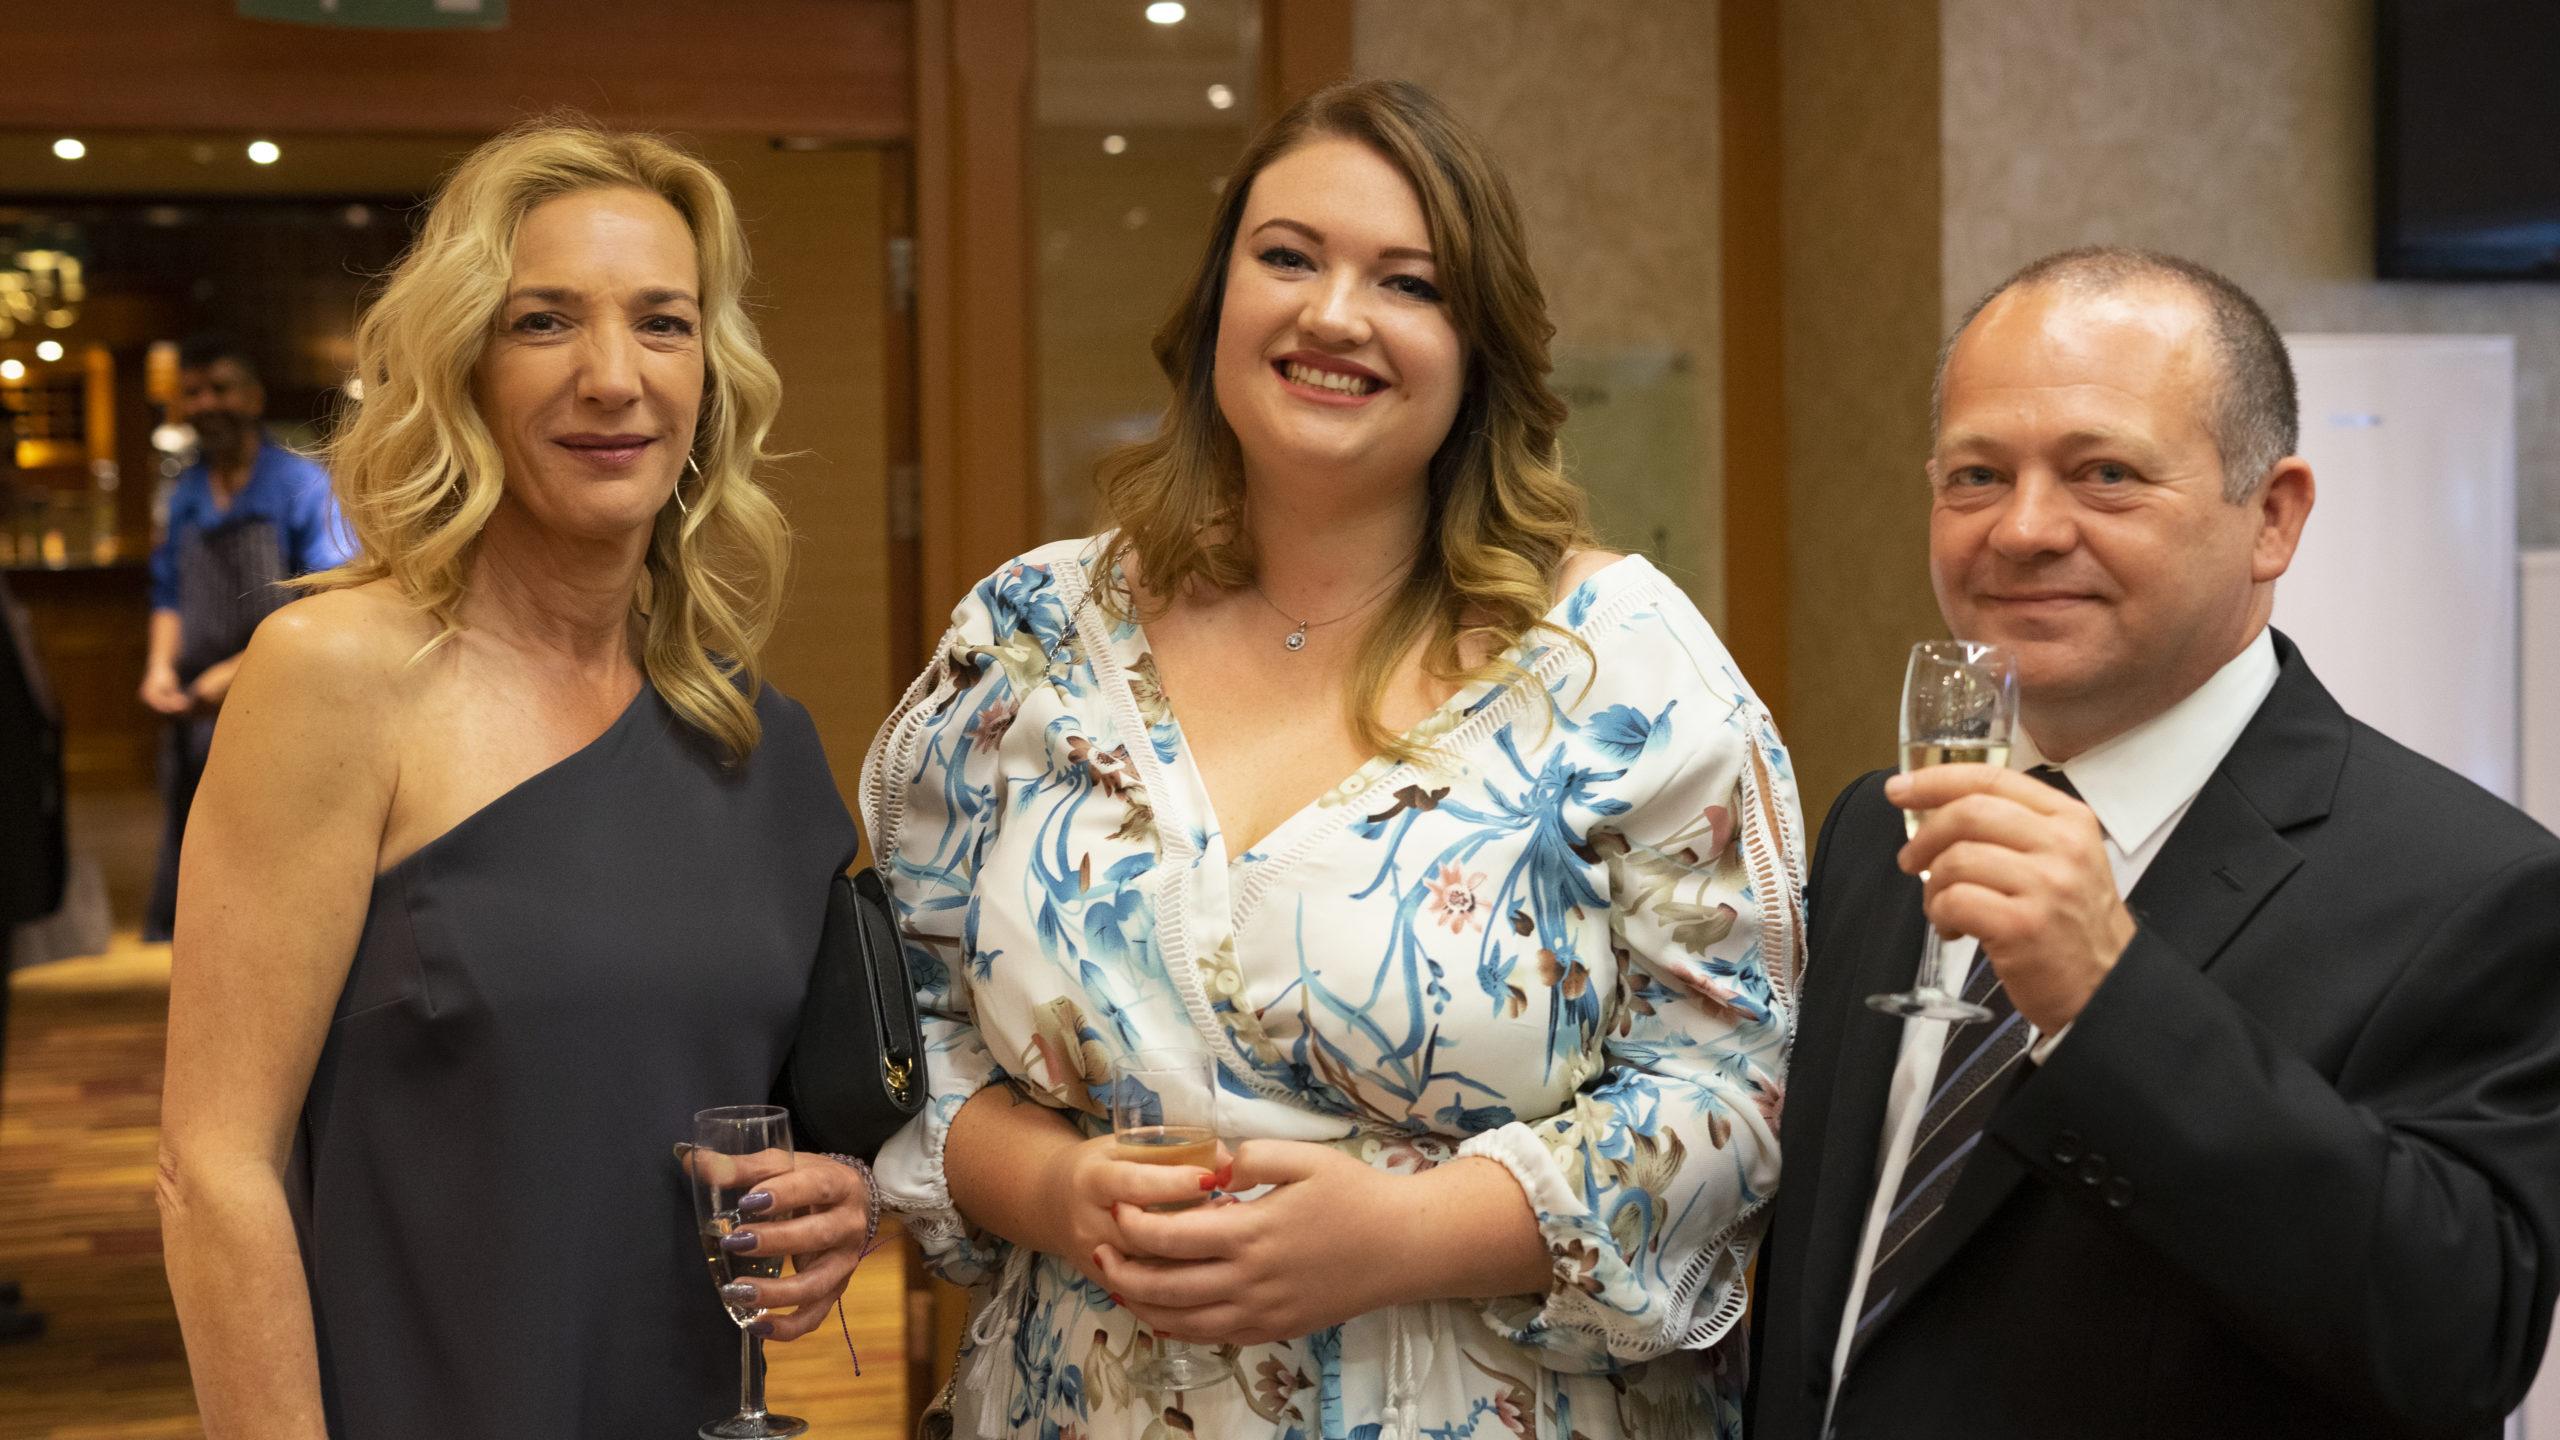 Reuse Network Conference 2019 dressing up for awards